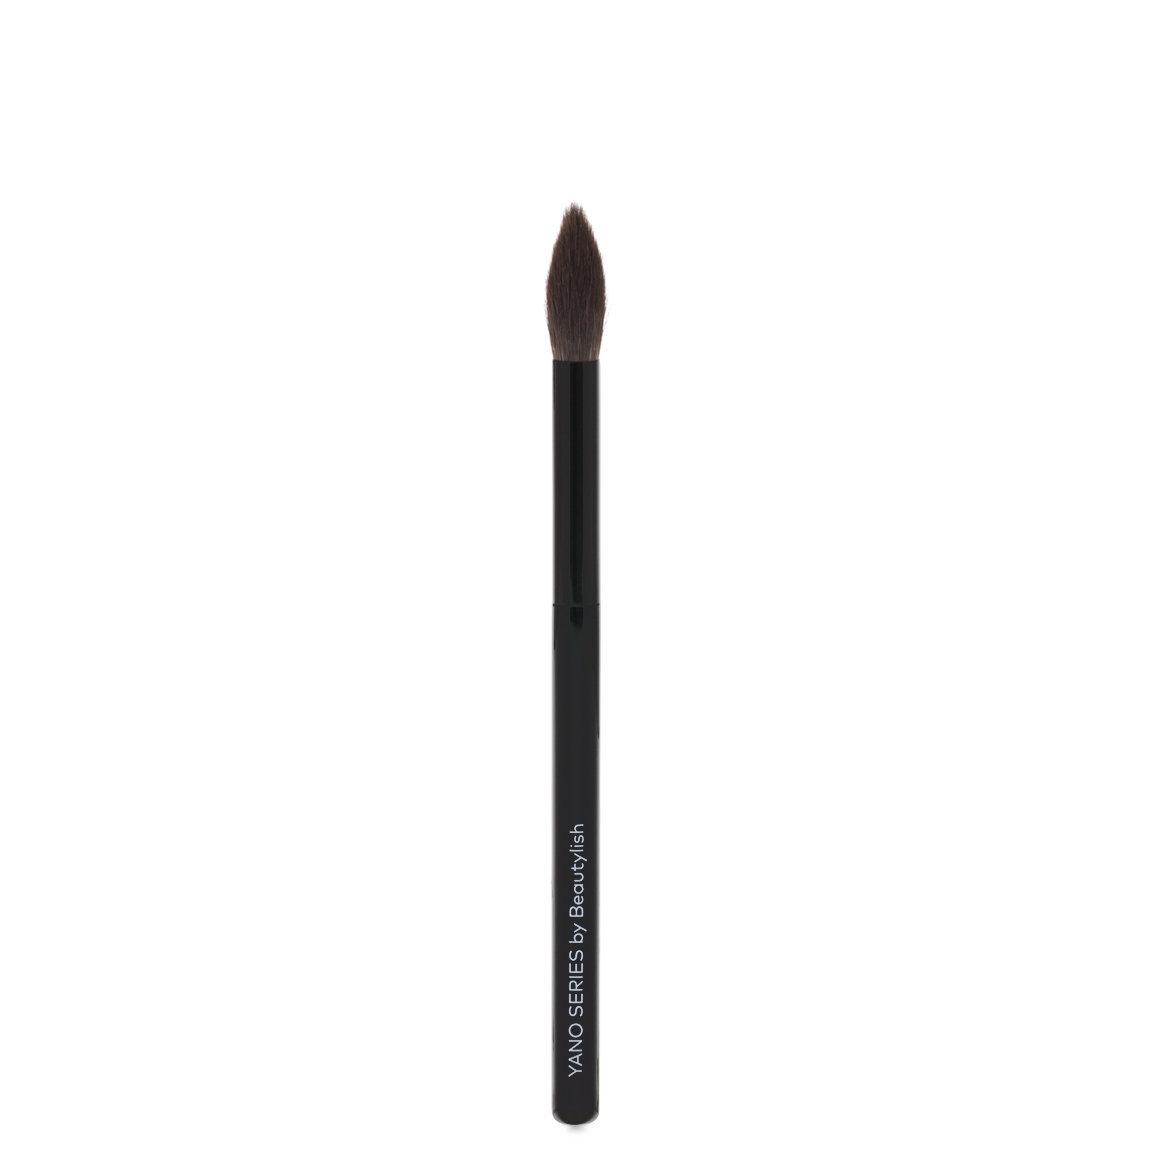 Beautylish Presents Yano Series Brush 06 Large Tapered Eyeshadow alternative view 1 - product swatch.